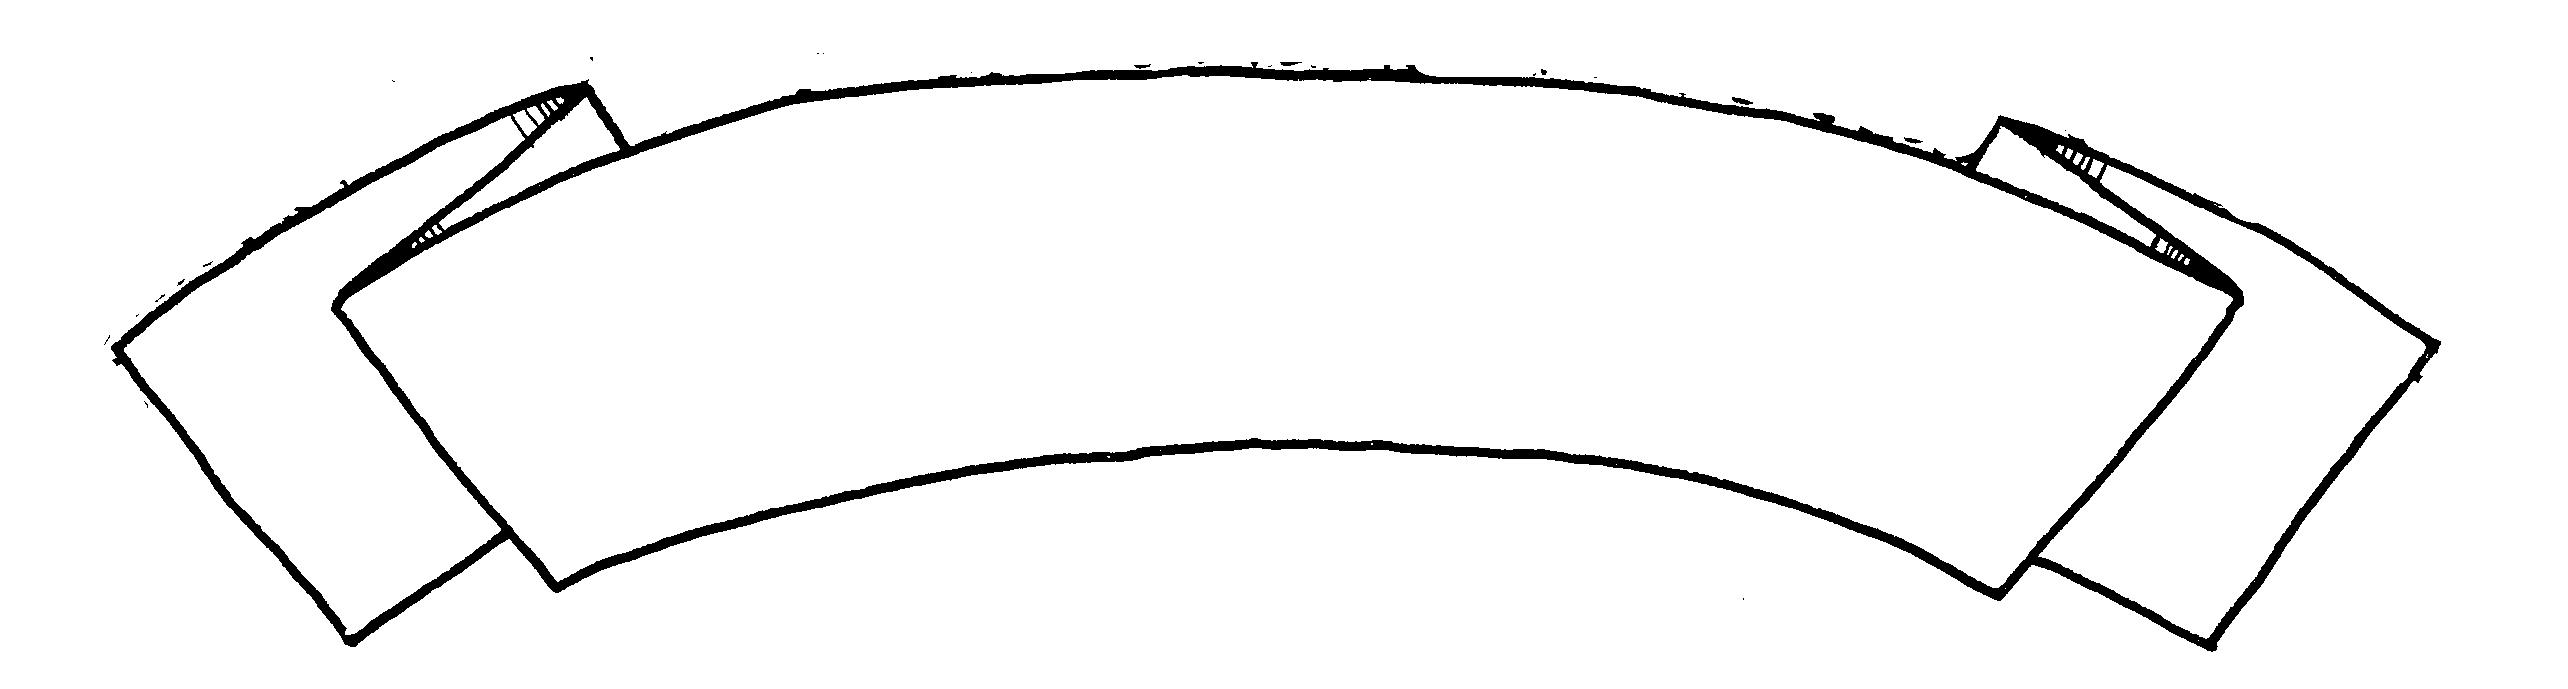 Images For Ribbon Banner Clip Art